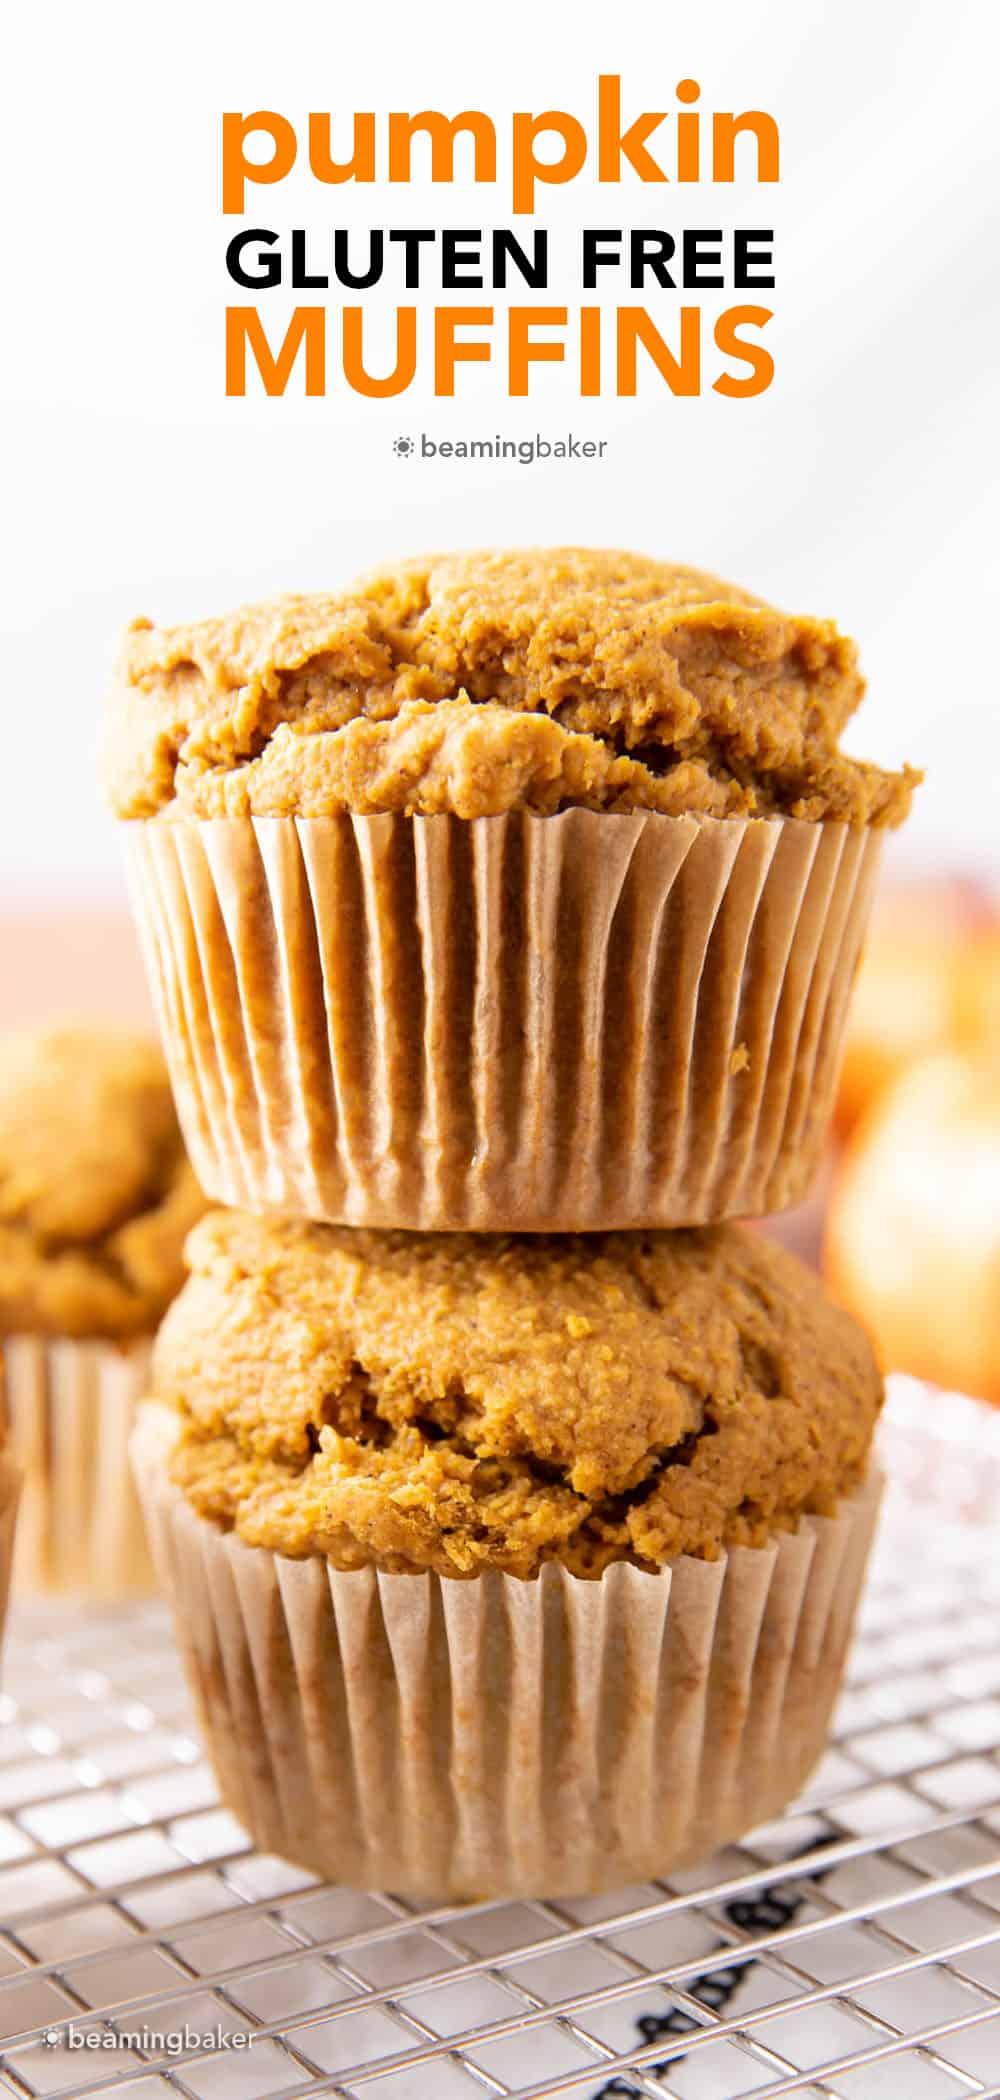 Gluten Free Pumpkin Muffins (GF): satisfying, cozy GF pumpkin muffins! The best gluten free pumpkin muffins recipe—lightly sweet & moist with deliciously spiced pumpkin flavor! #GlutenFree #GF #Pumpkin #Muffins | Recipe at BeamingBaker.com